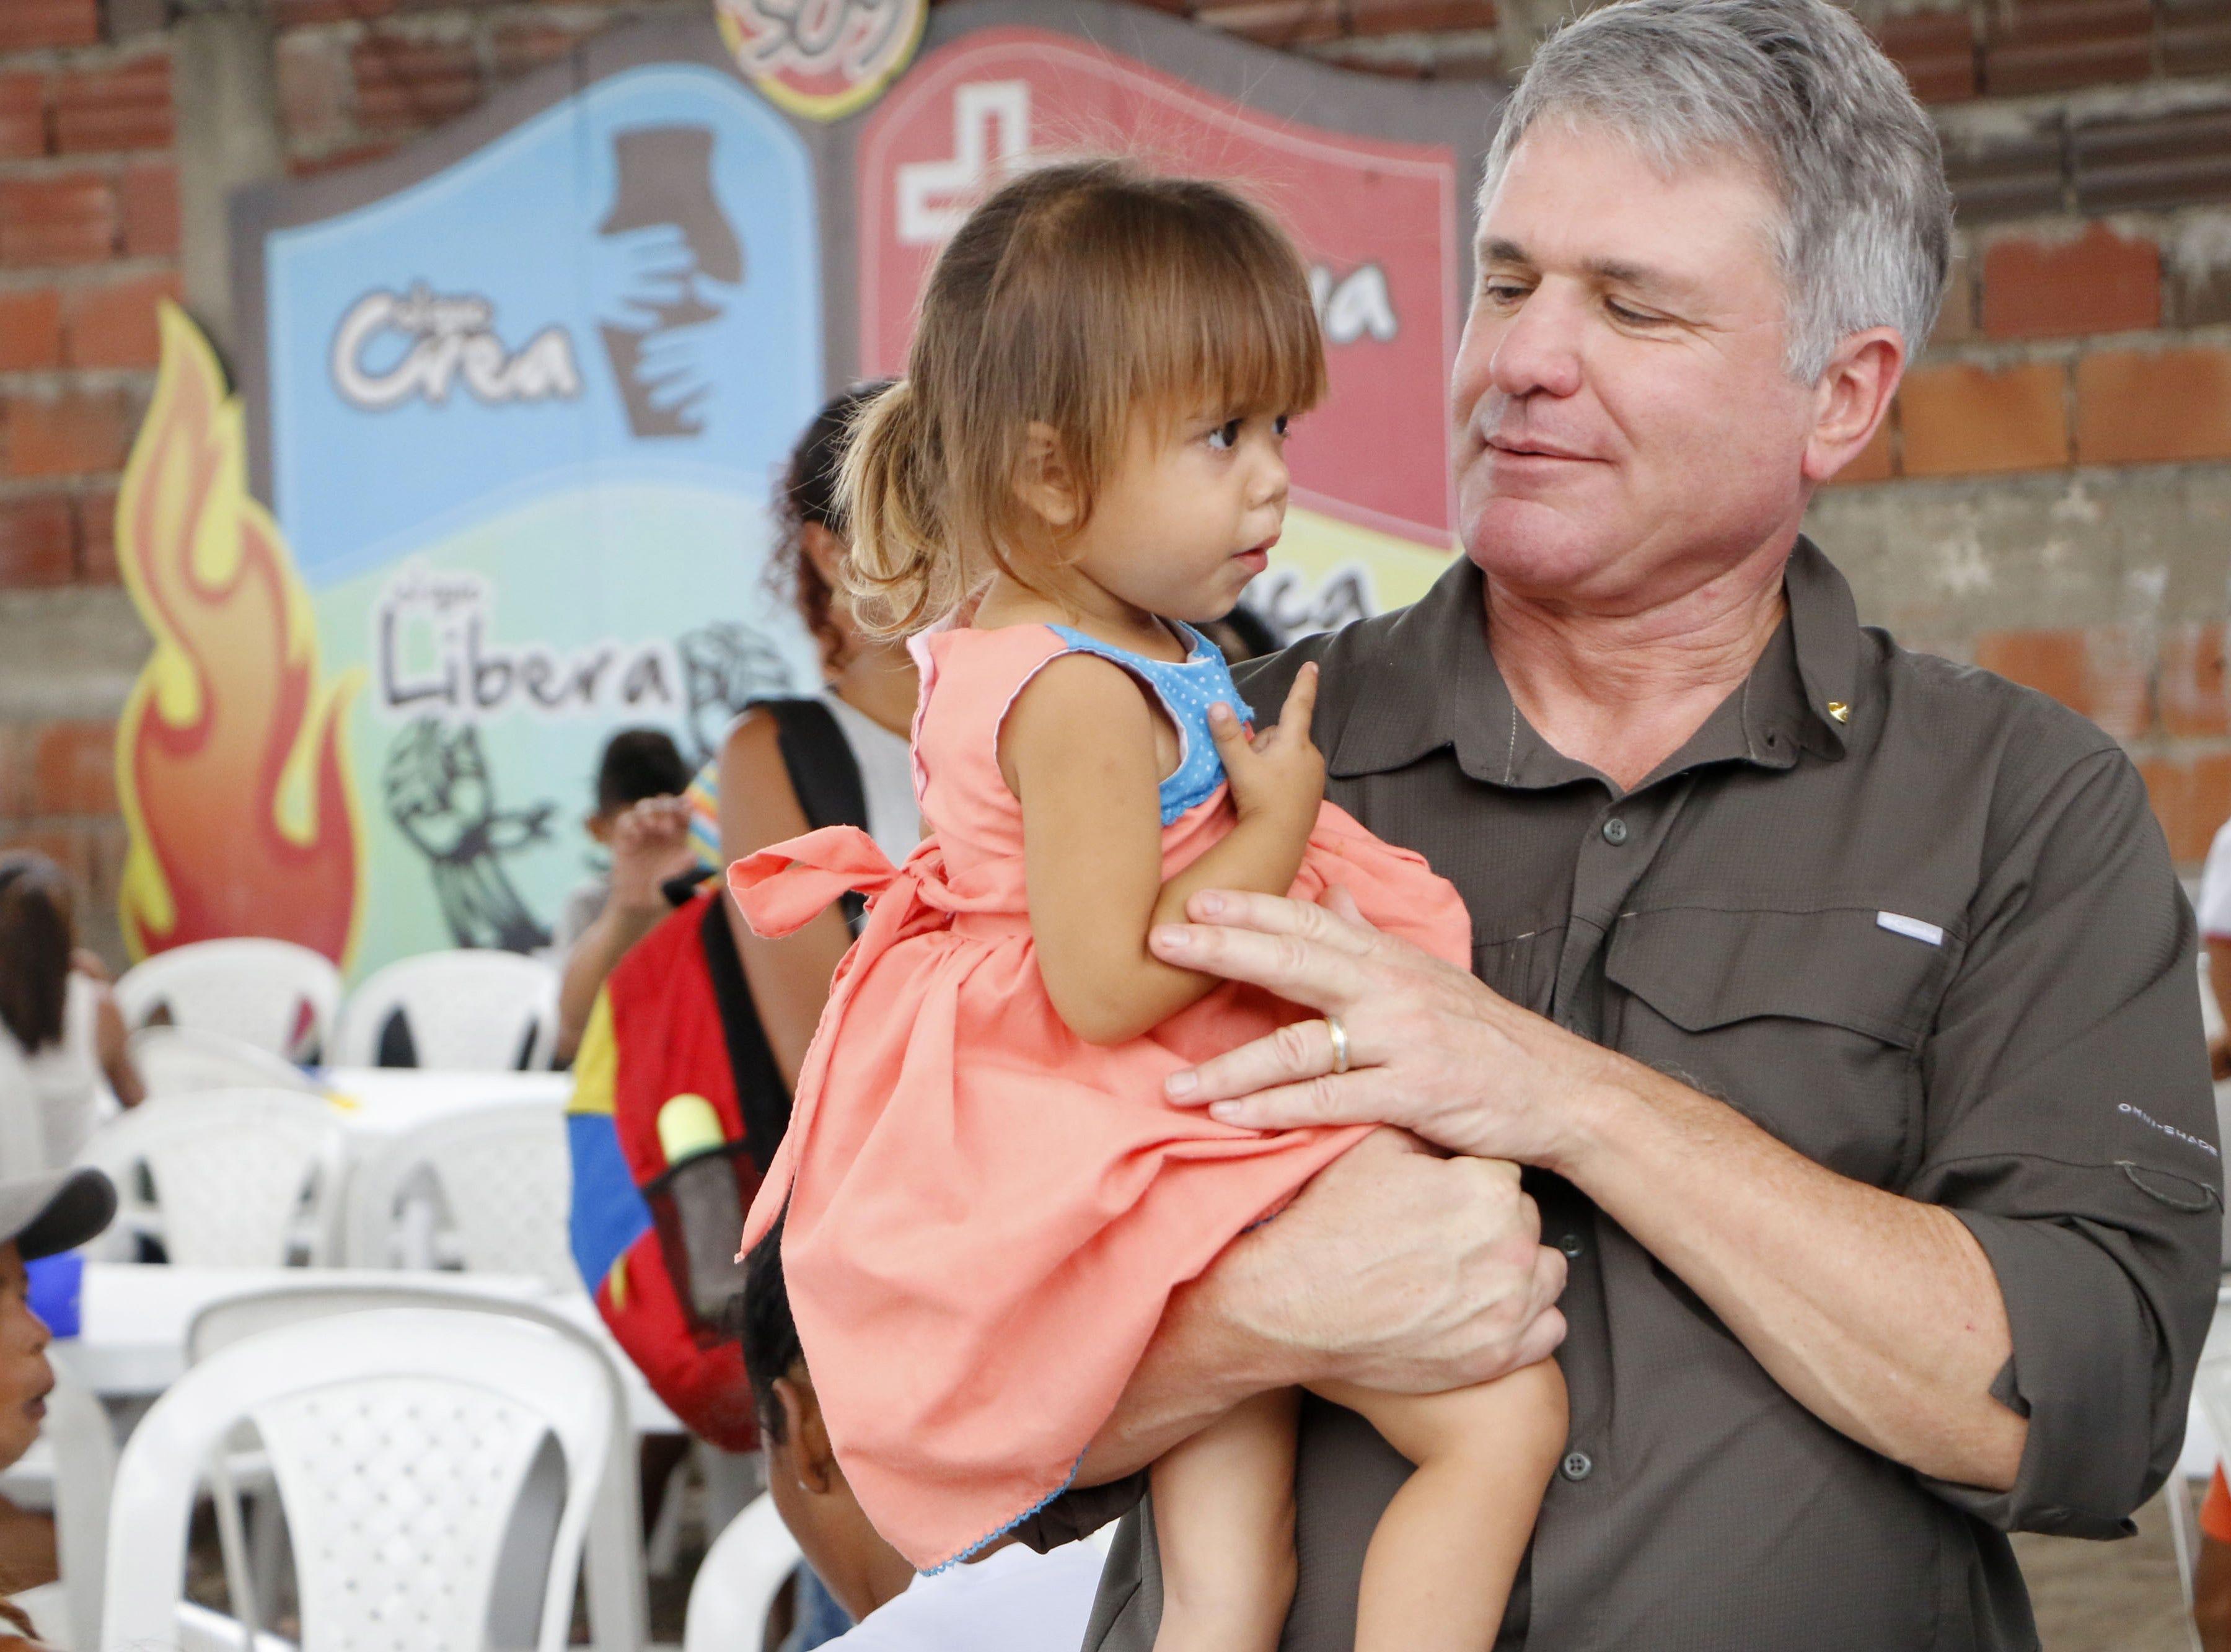 US Senator Michael McCaul holds a Venezuelan girl, during a hearing by several US senators on the Simon Bolivar international bridge, on the border between Venezuela and Cucuta, Colombia on March 29, 2019.